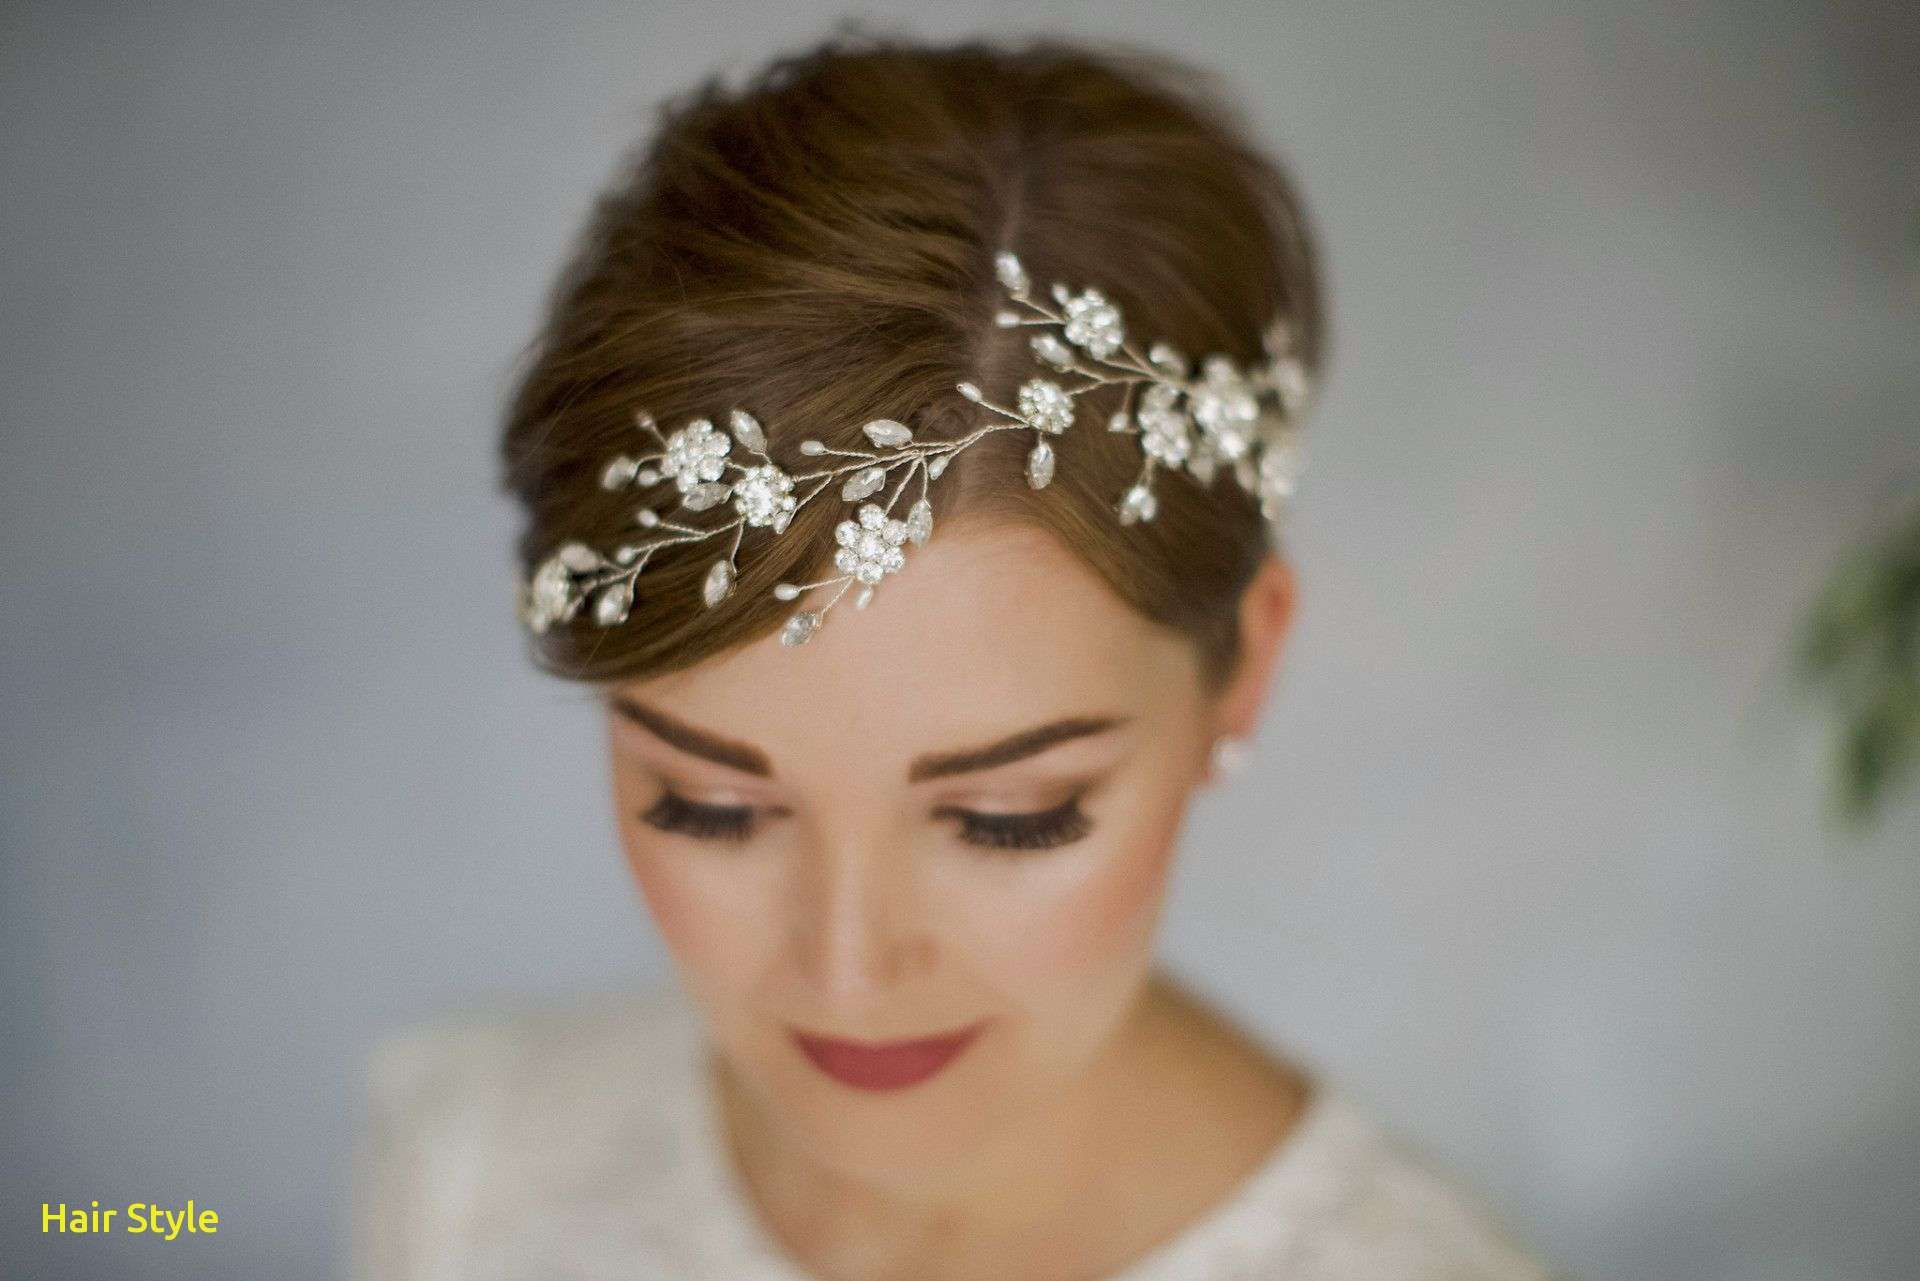 Account Suspended Hochzeitsfrisuren Kurze Haare Hochzeitsfrisuren Haare Hochzeit